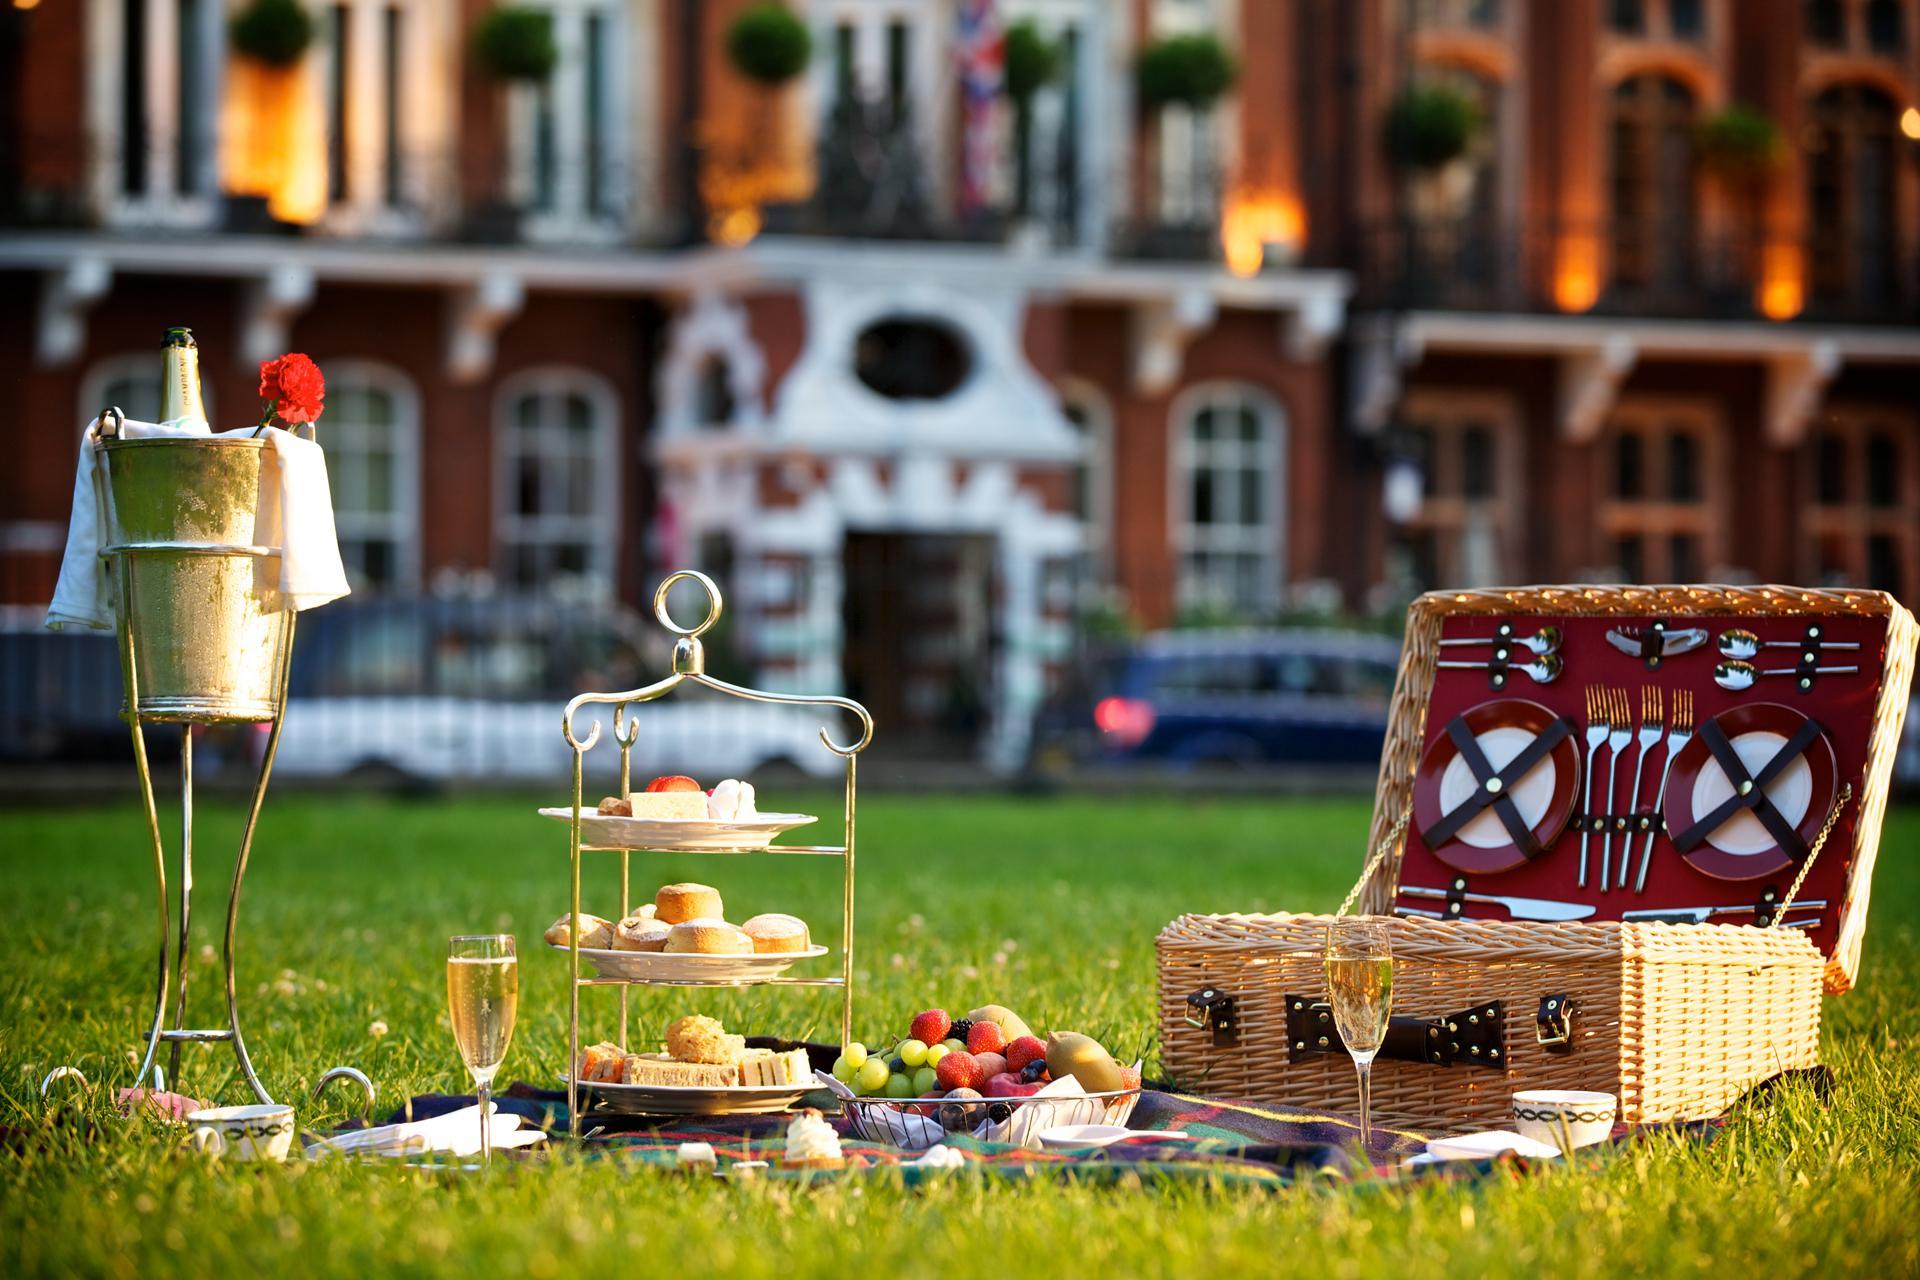 The Milestone picnic in the park